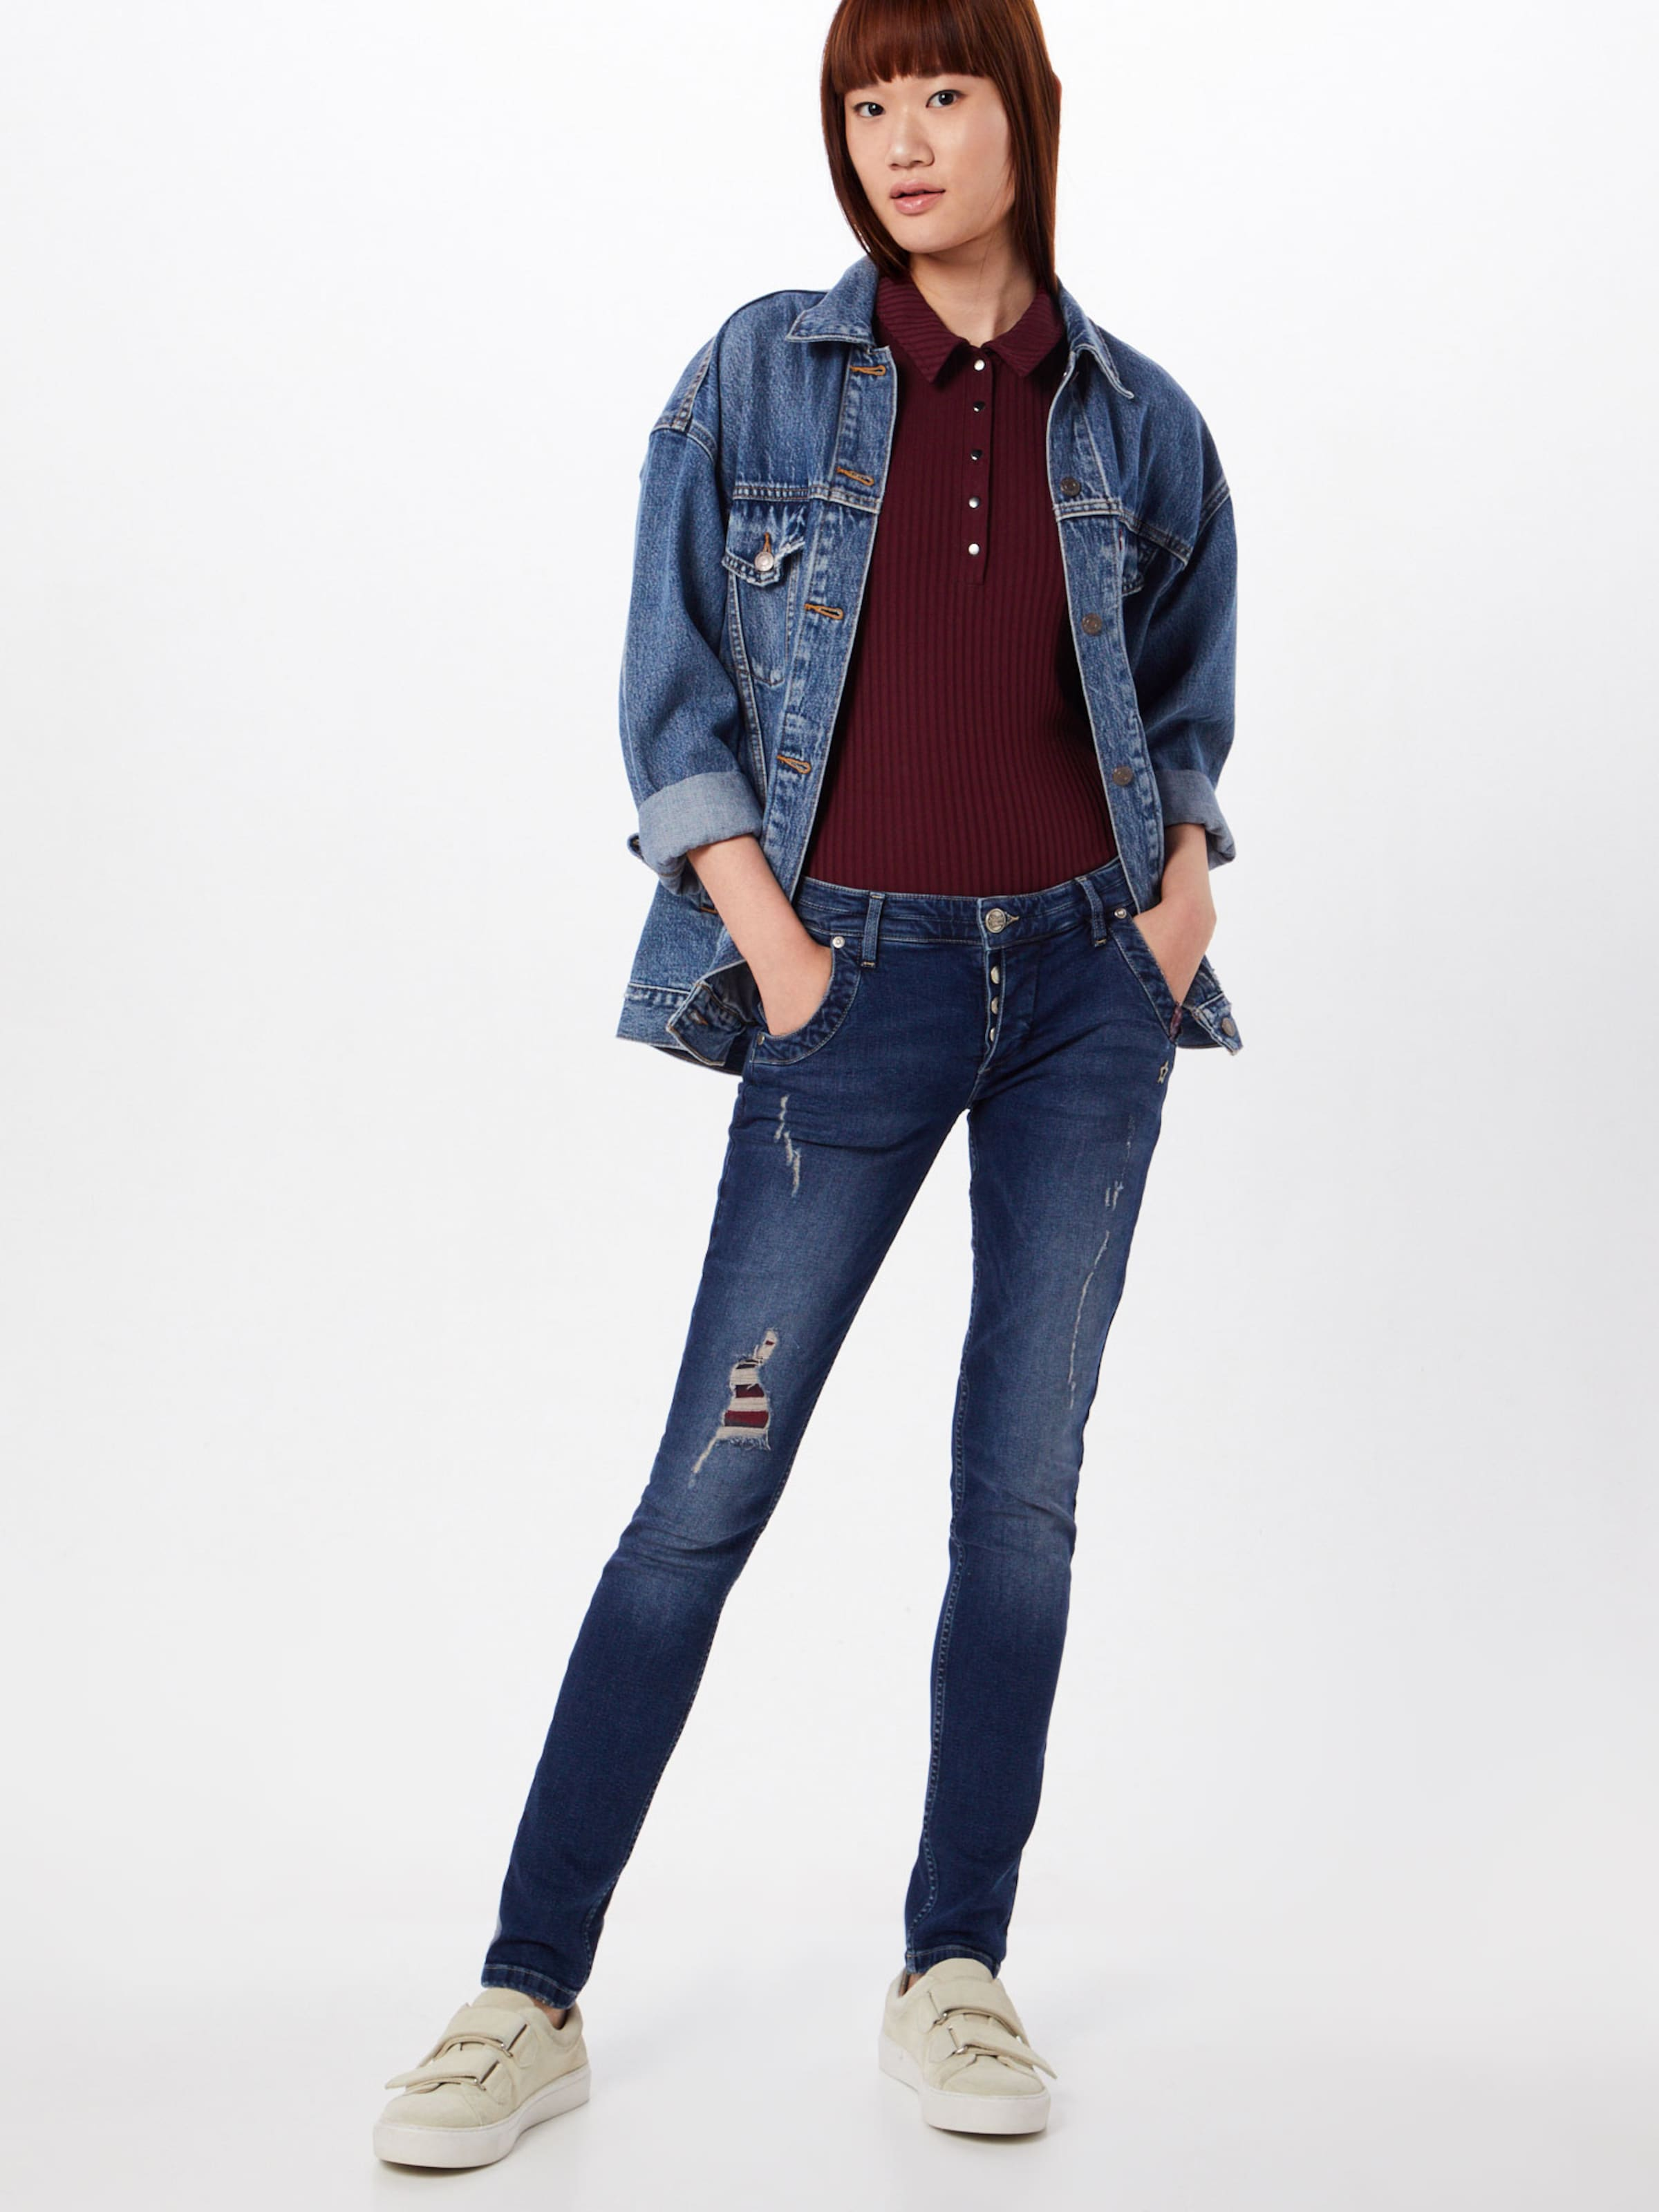 Glücksstern Denim In Blue Jeans 'petra' hQxtsdrC